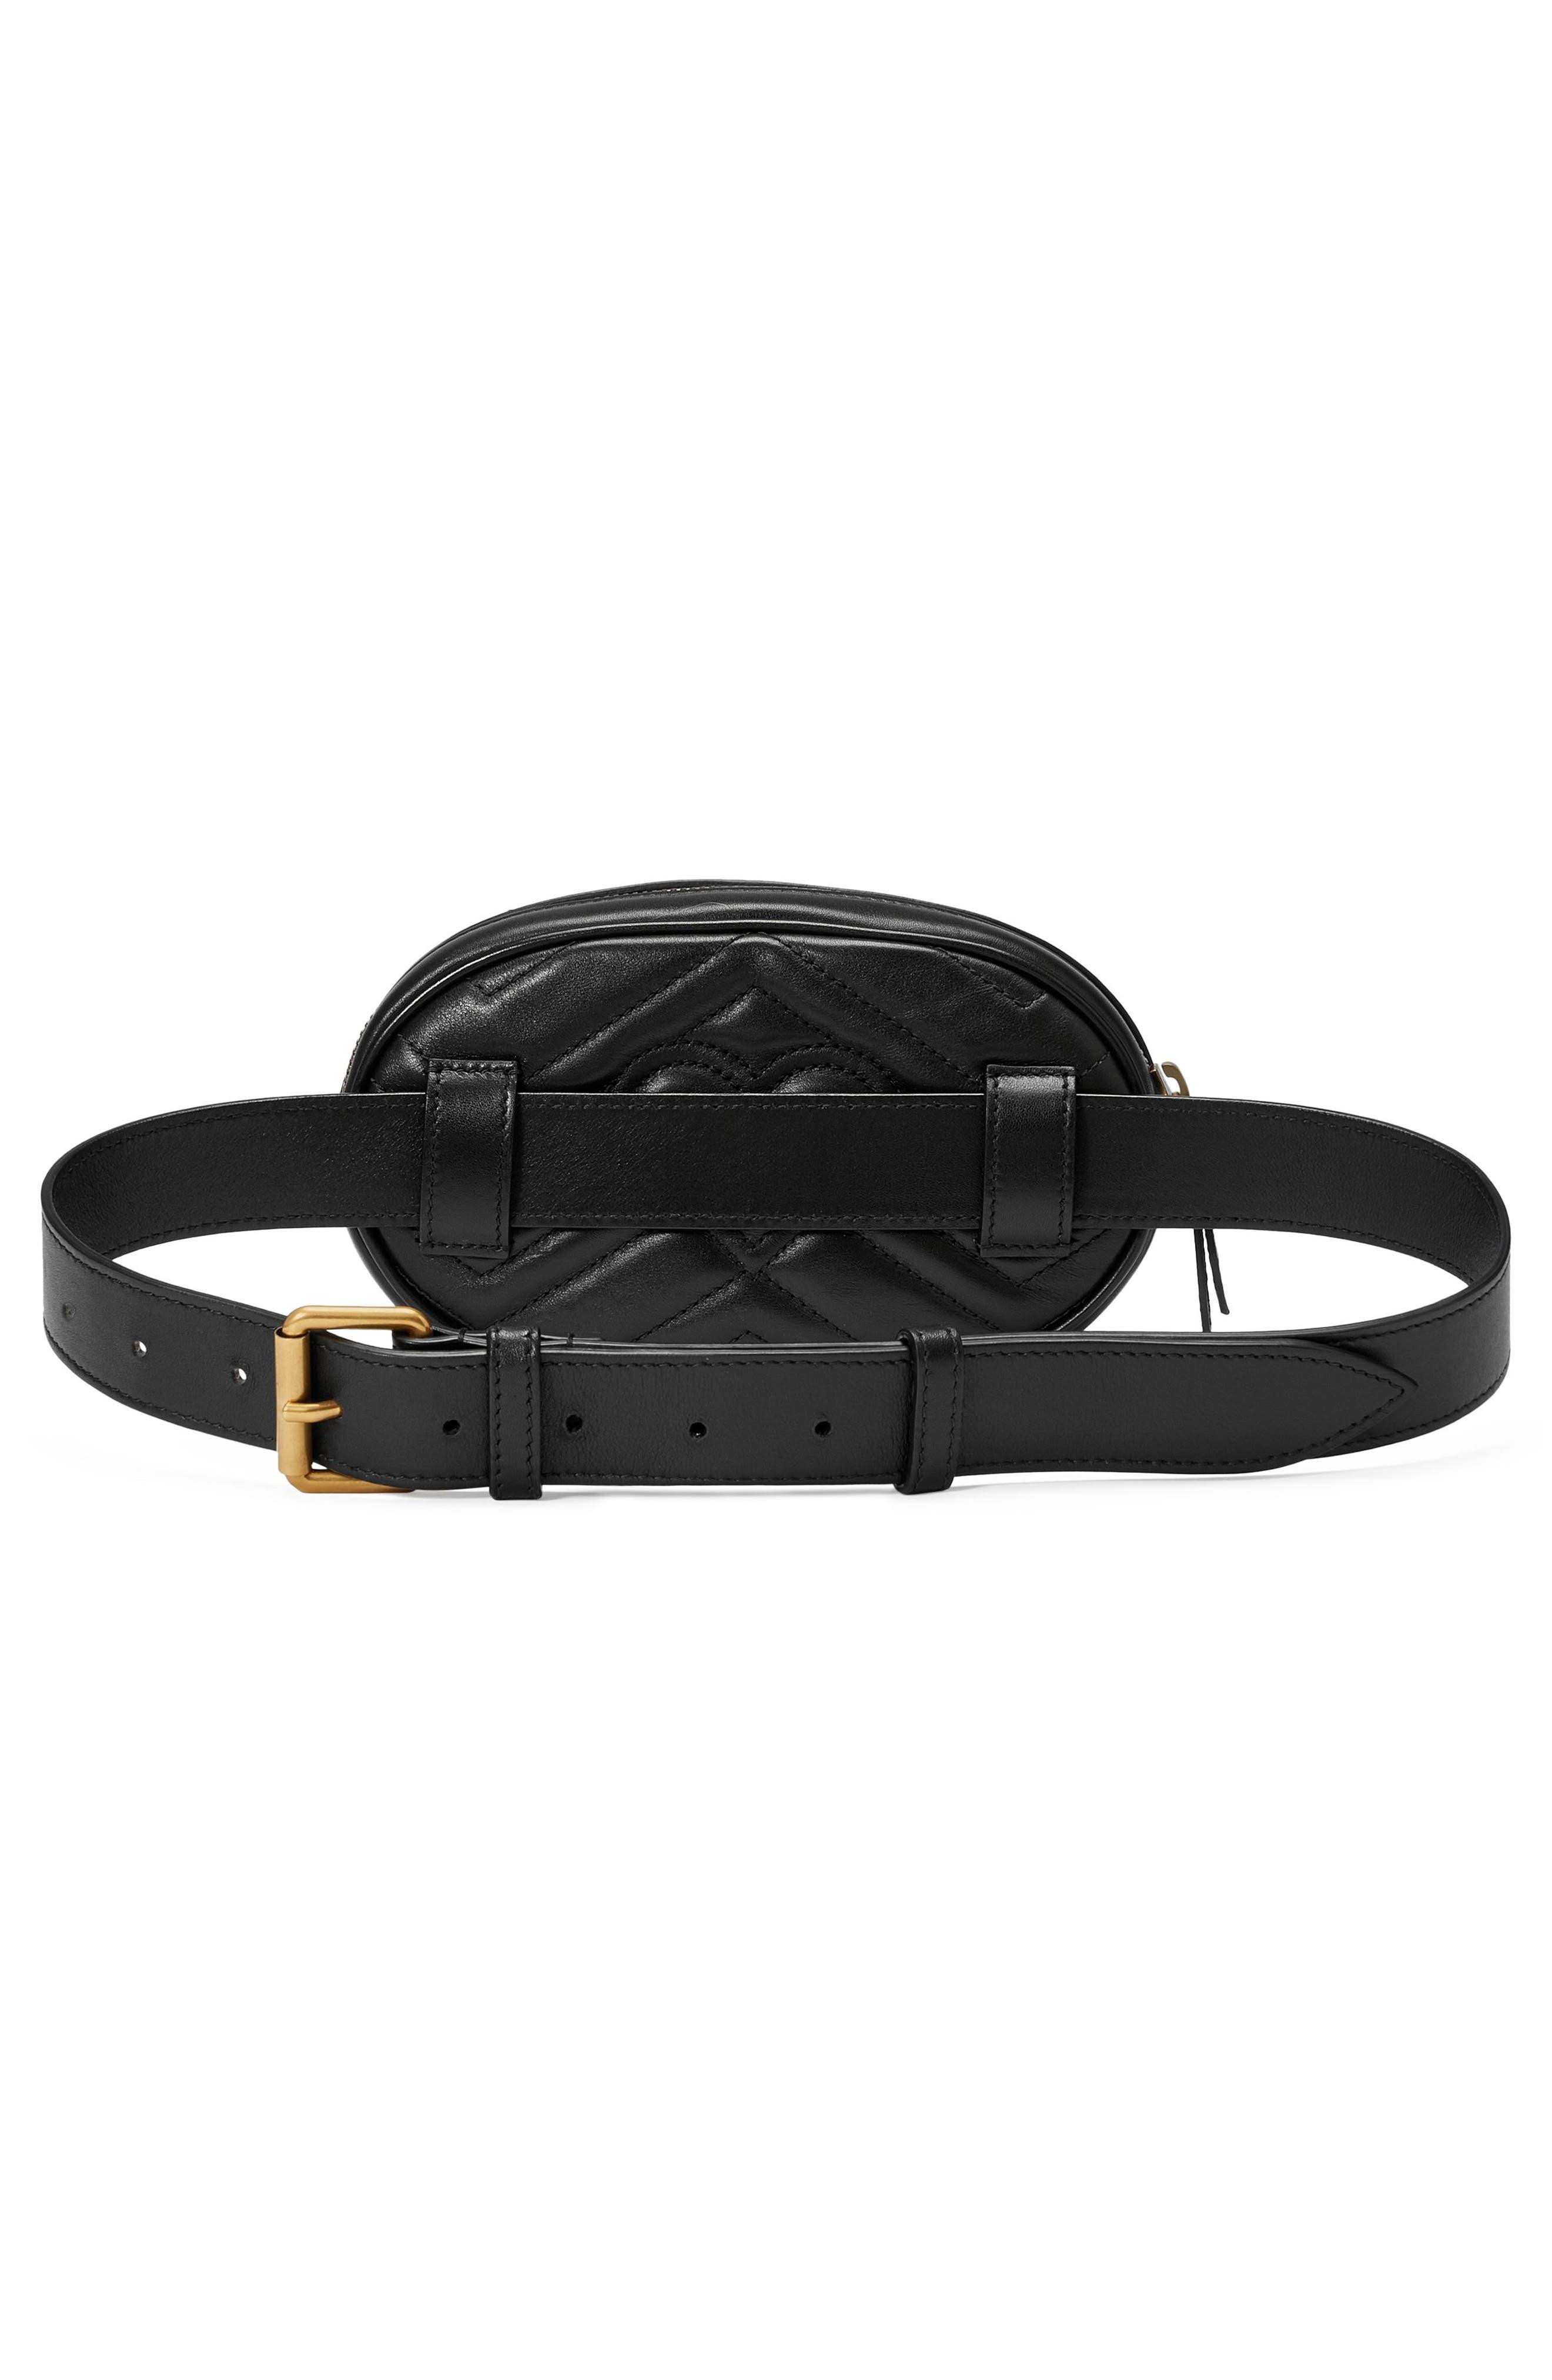 GG Marmont 2.0 Matelassé Leather Belt Bag,                             Alternate thumbnail 3, color,                             NERO